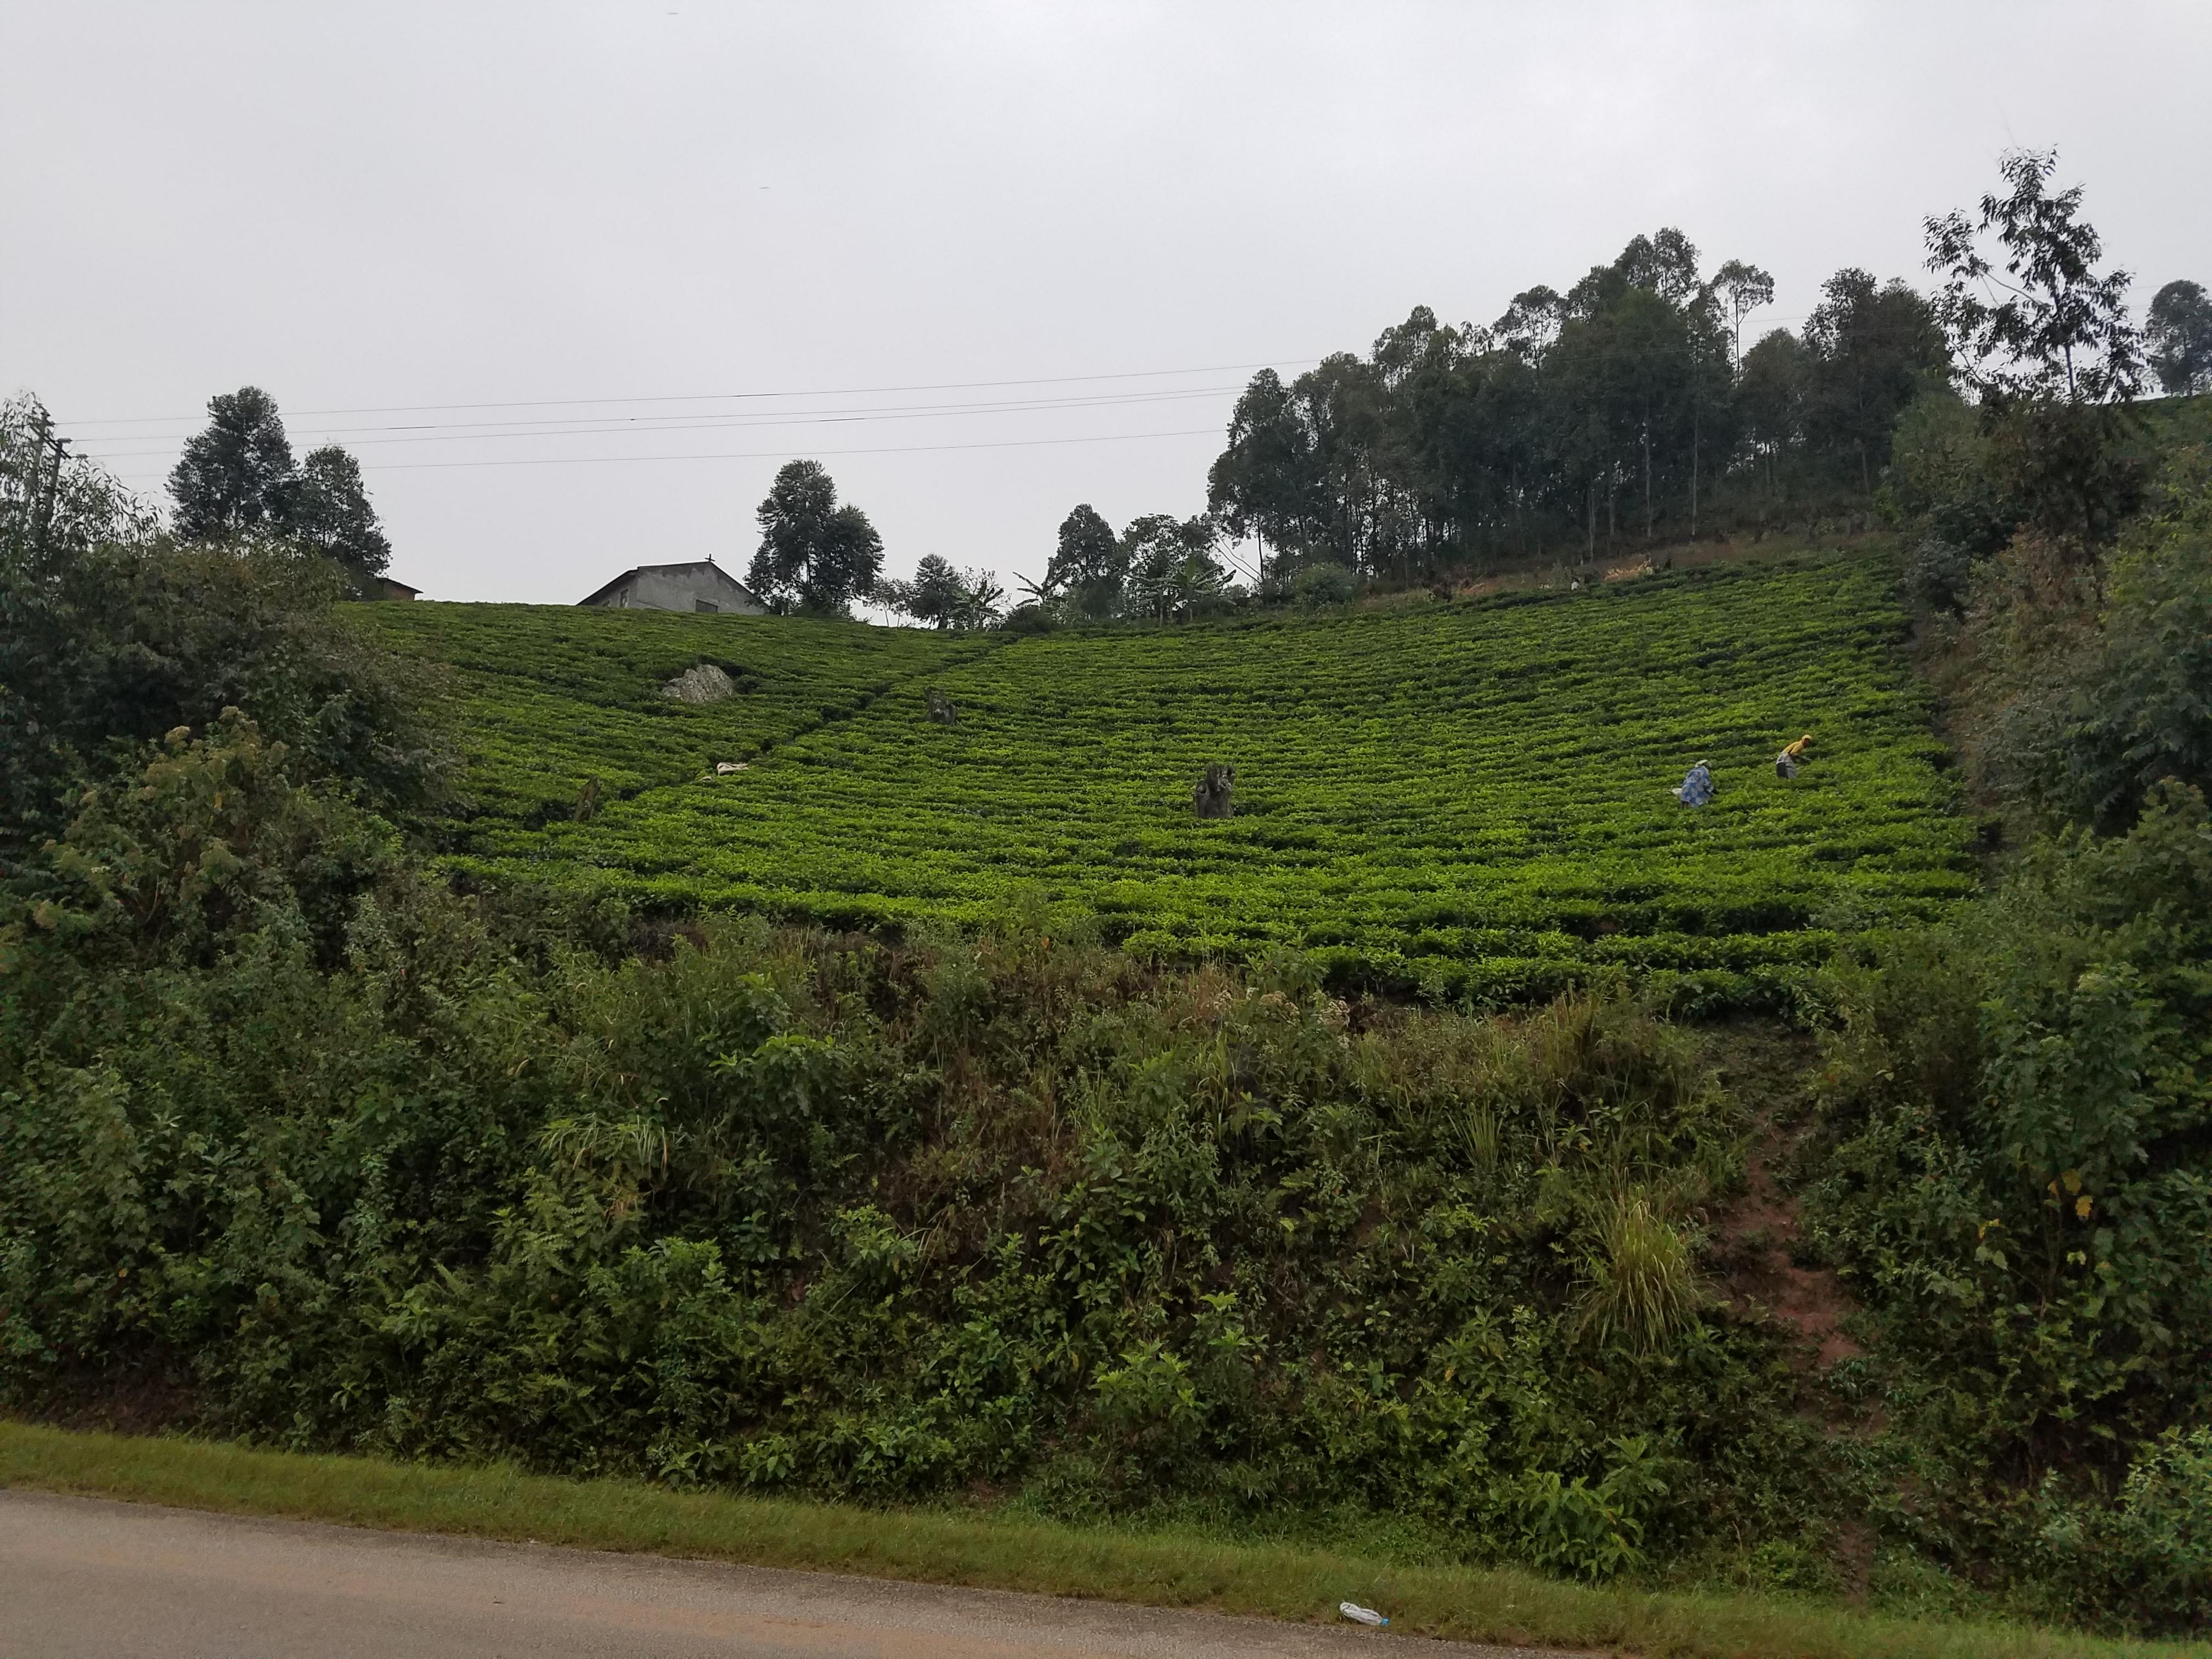 safari, Uganda, Red Chili,  Kalinzu Forrest, eco-tourism, rainforest, tea farming, tea terrace